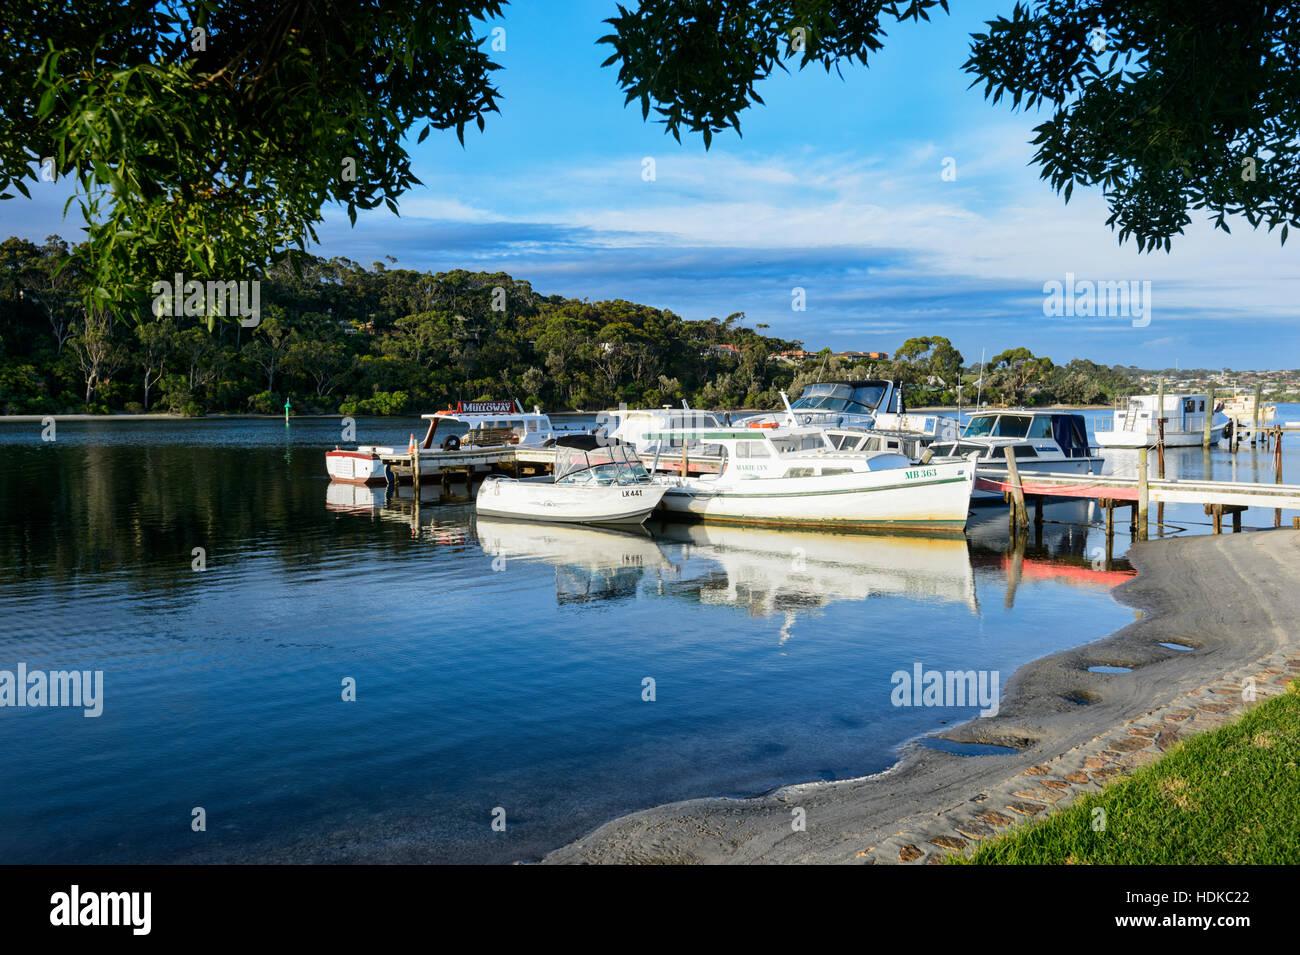 View of the Marina, Lakes Entrance, Victoria, VIC, Australia Stock